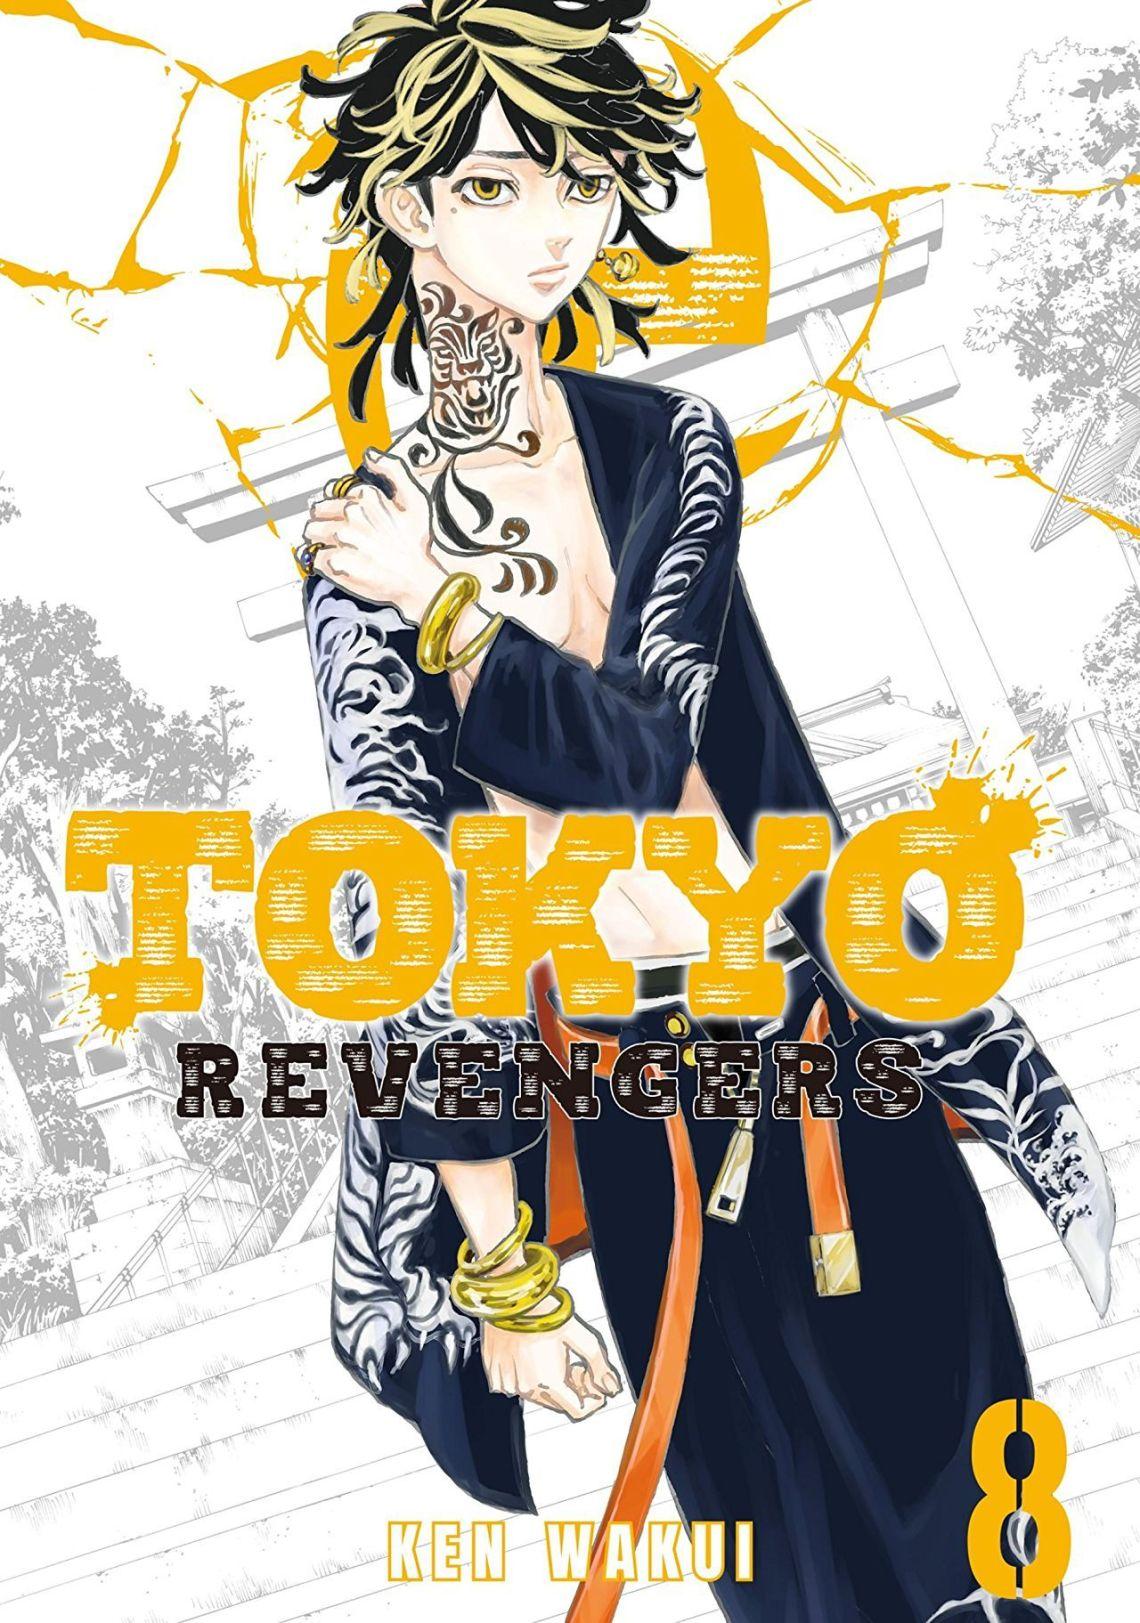 Tokyo Revengers Wallpapers Wallpaper Cave